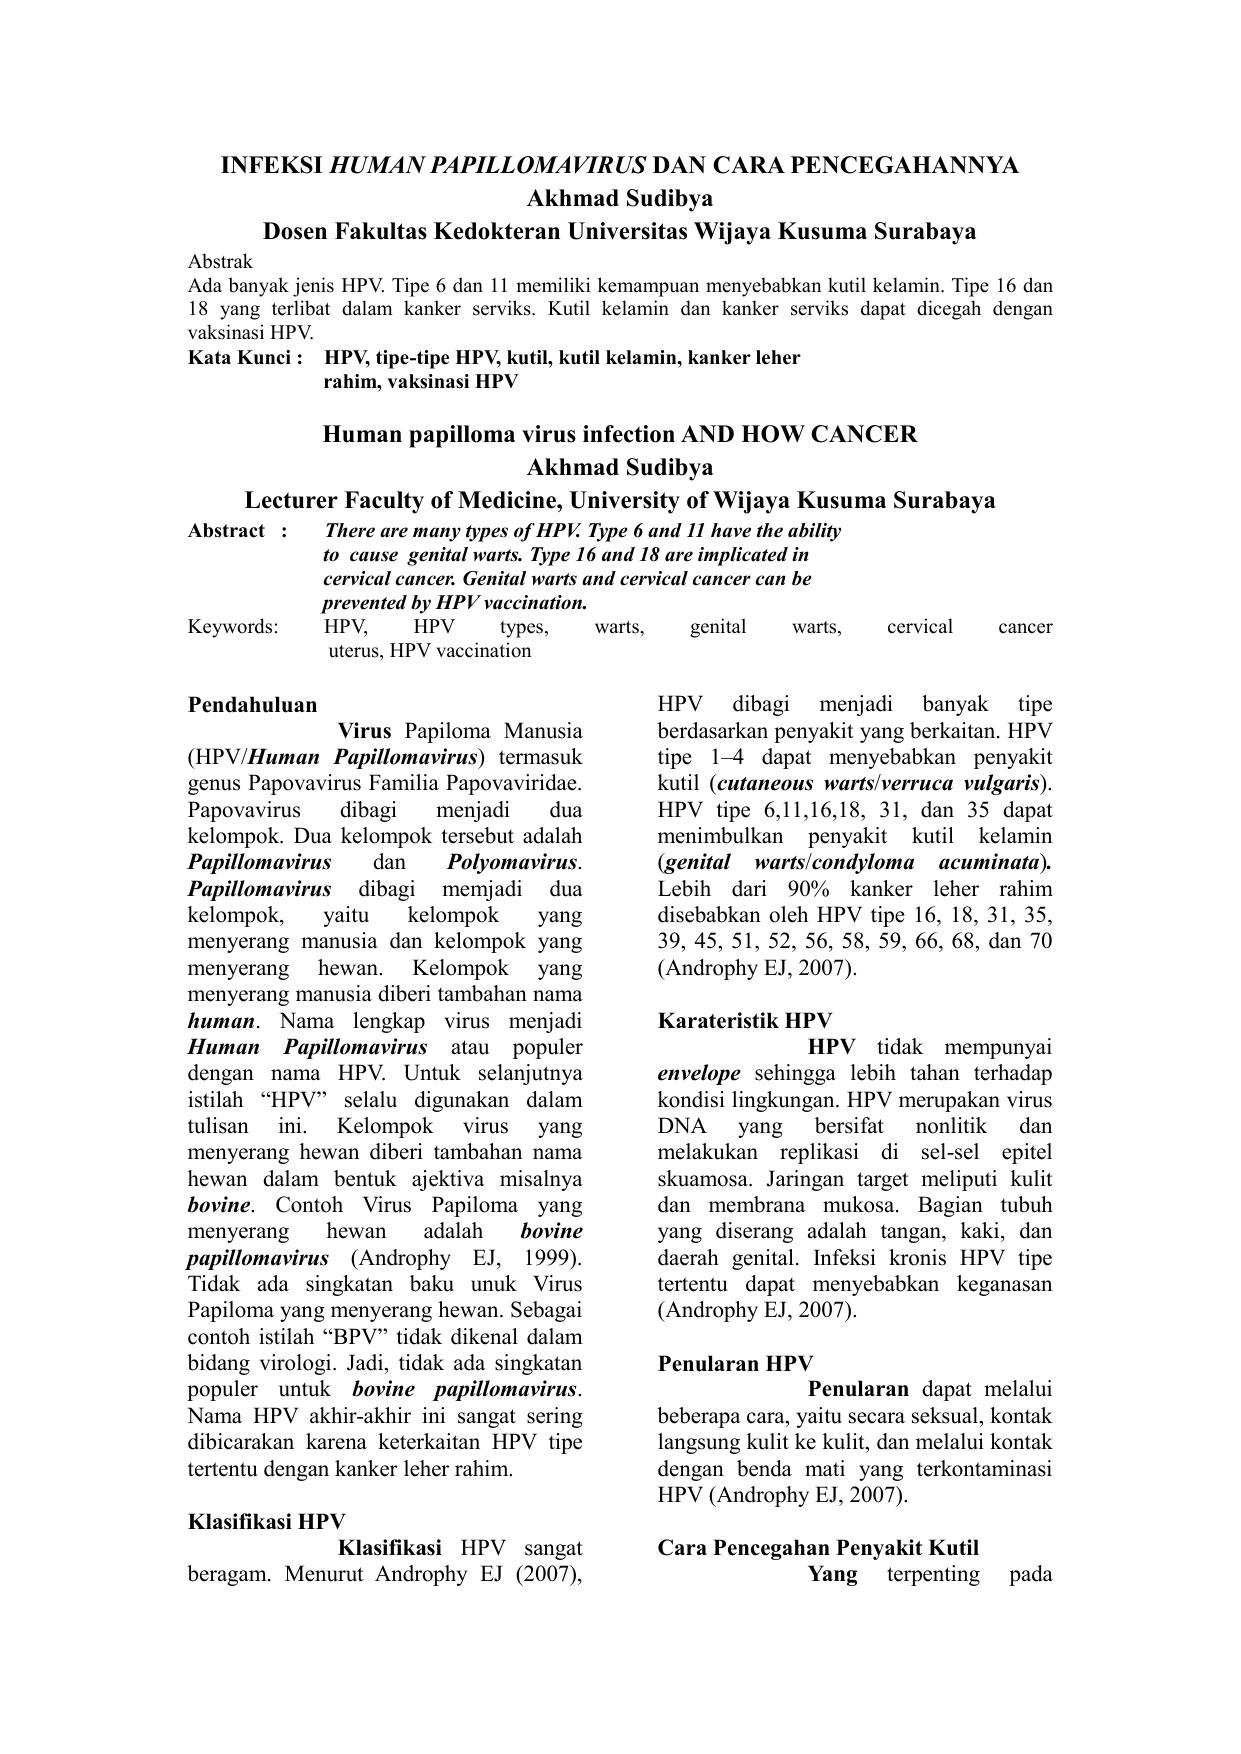 humani papiloma virus tip 16)